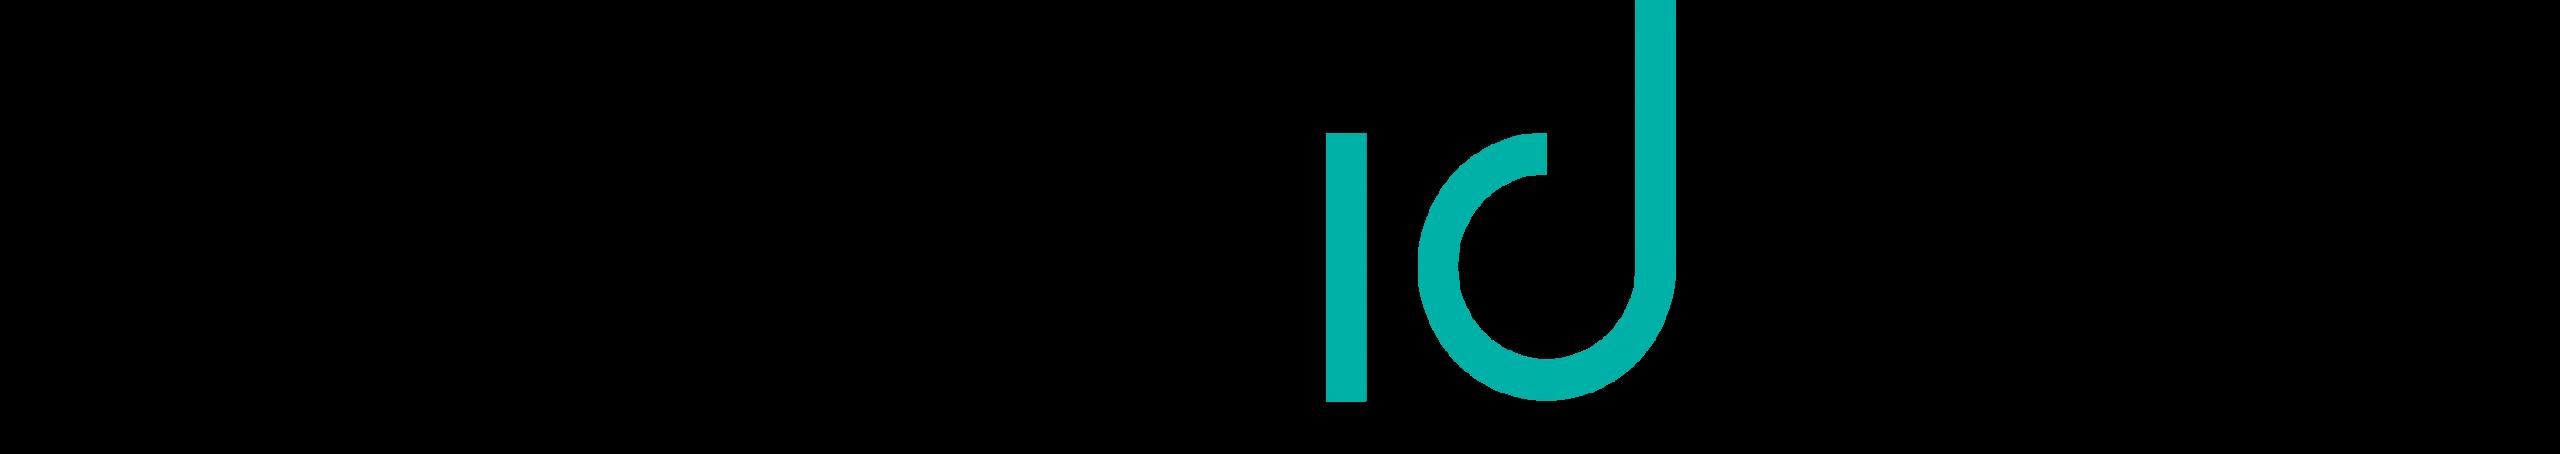 Emerid Pets logo 2